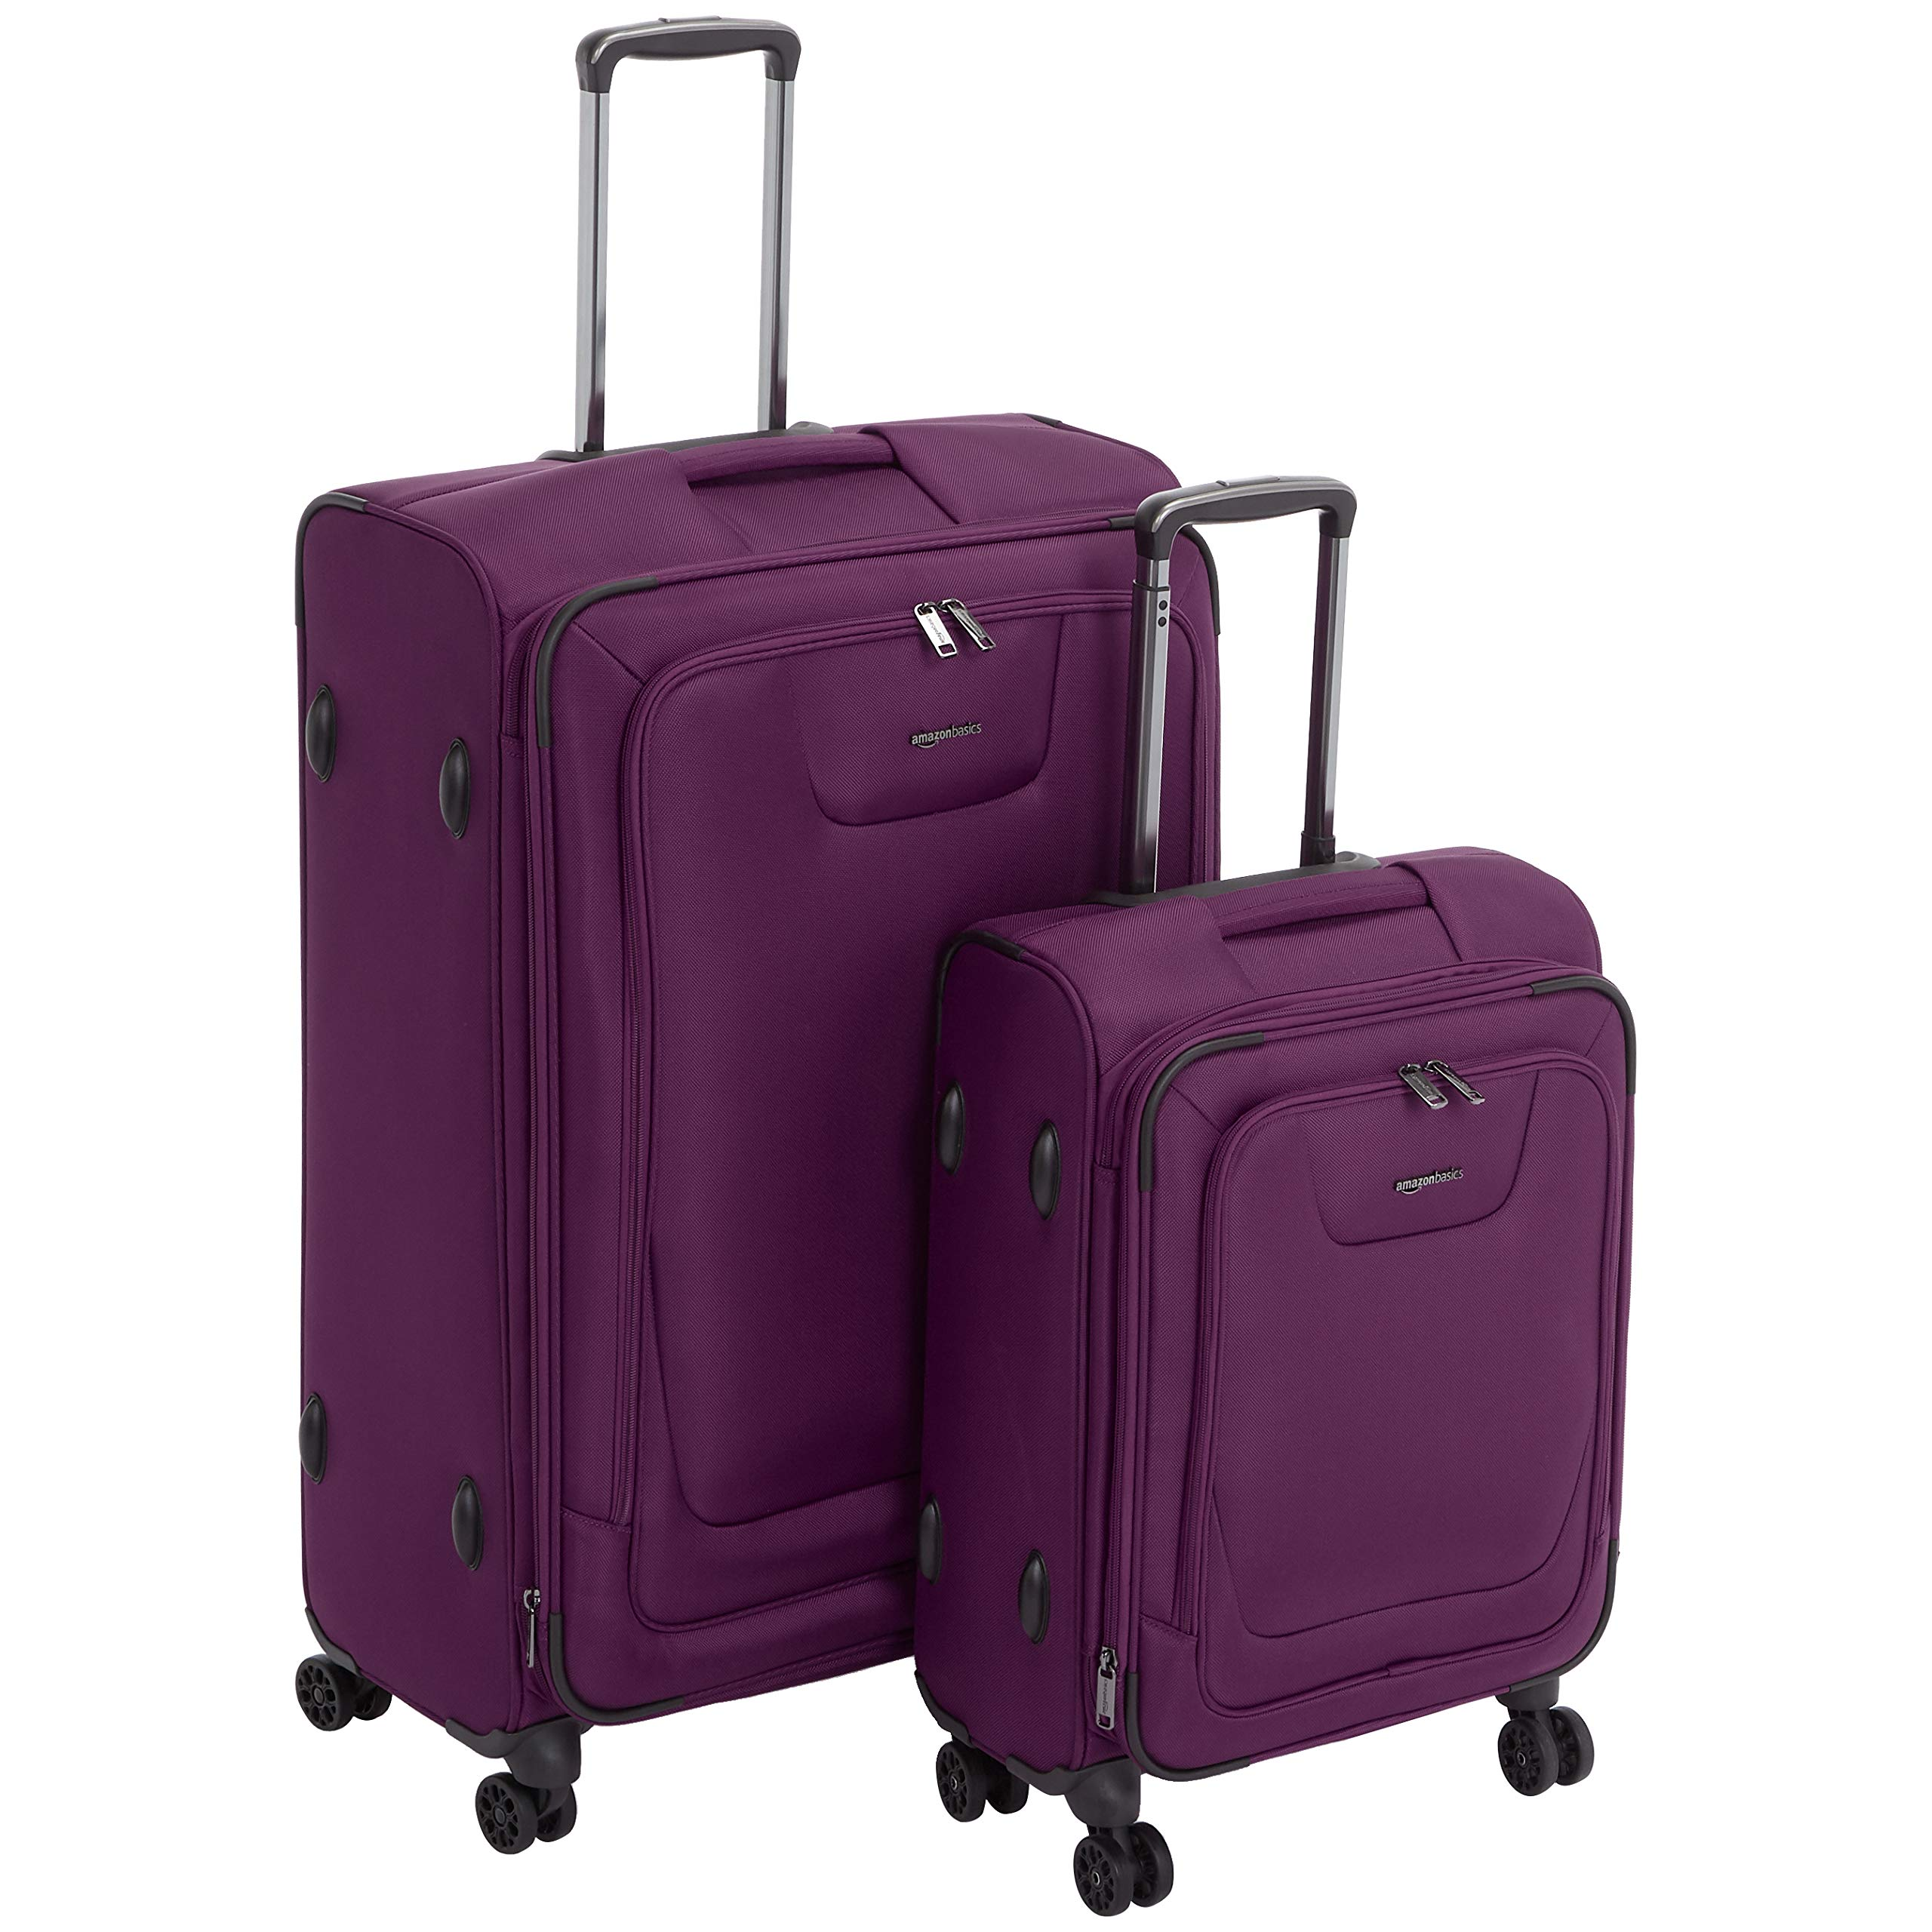 AmazonBasics Premium Expandable Softside Spinner Luggage With TSA Lock 2-Piece Set - 21/29-Inch, Purple